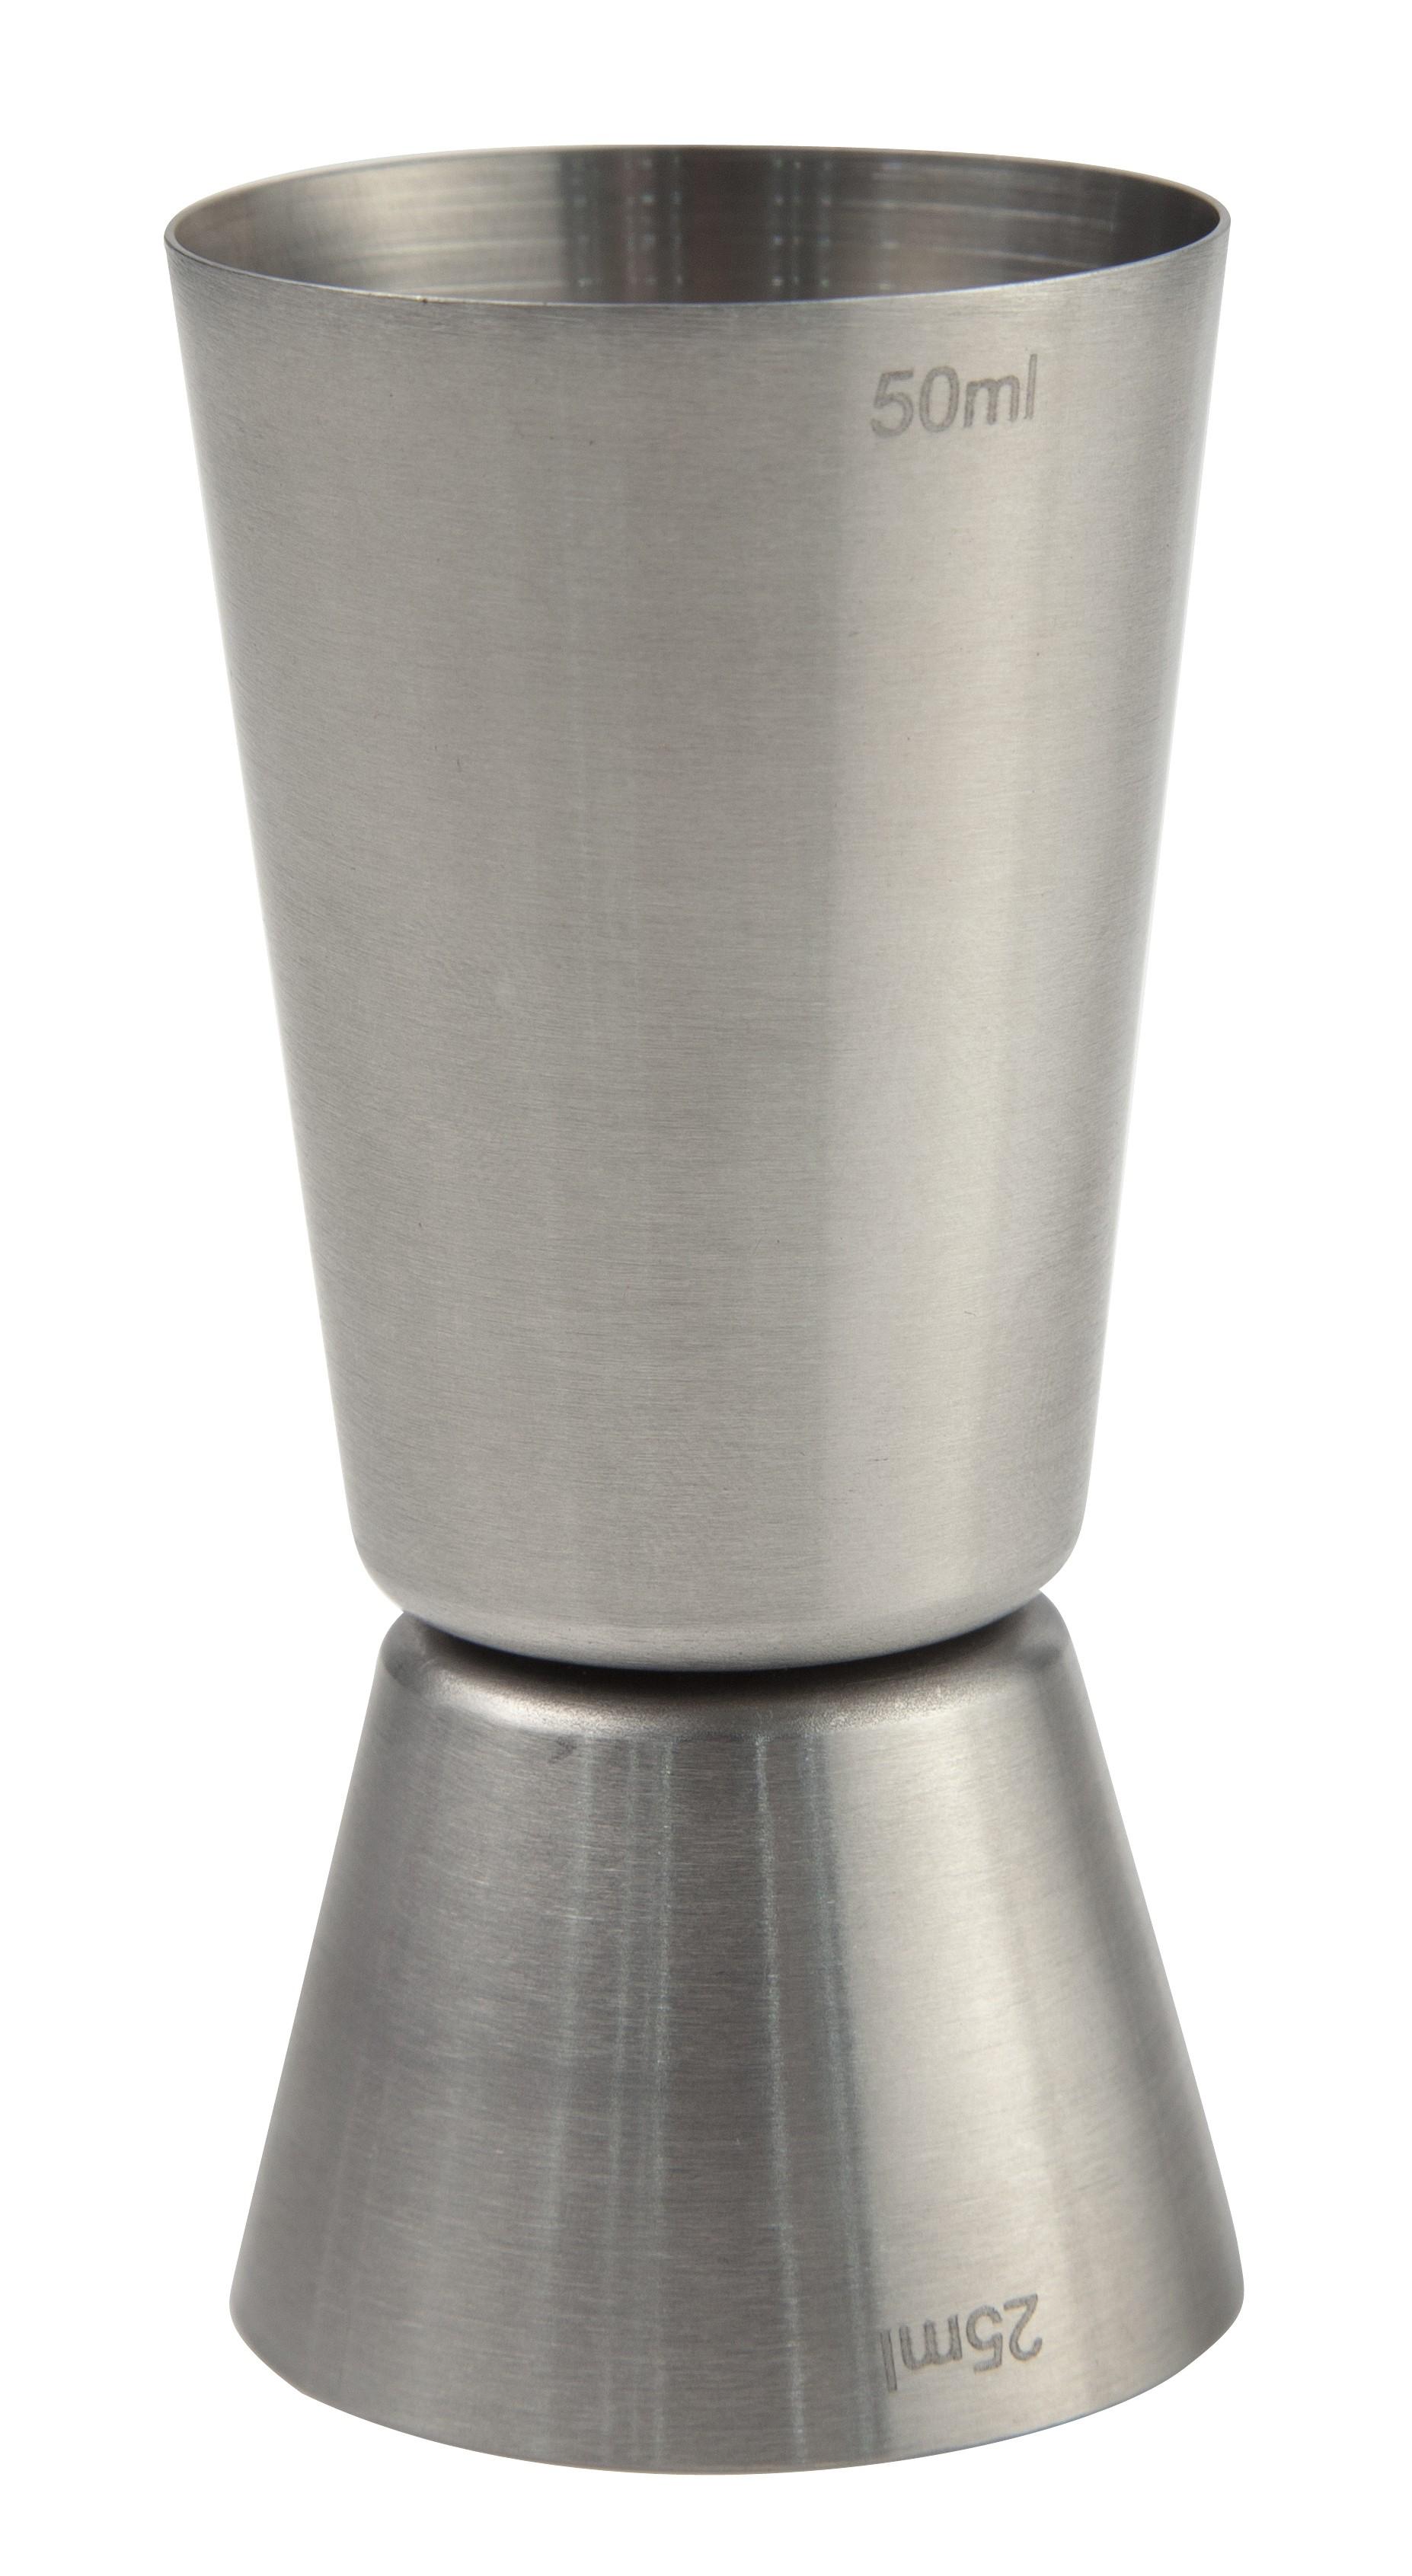 Professional Cocktail Jigger 25ml/50ml